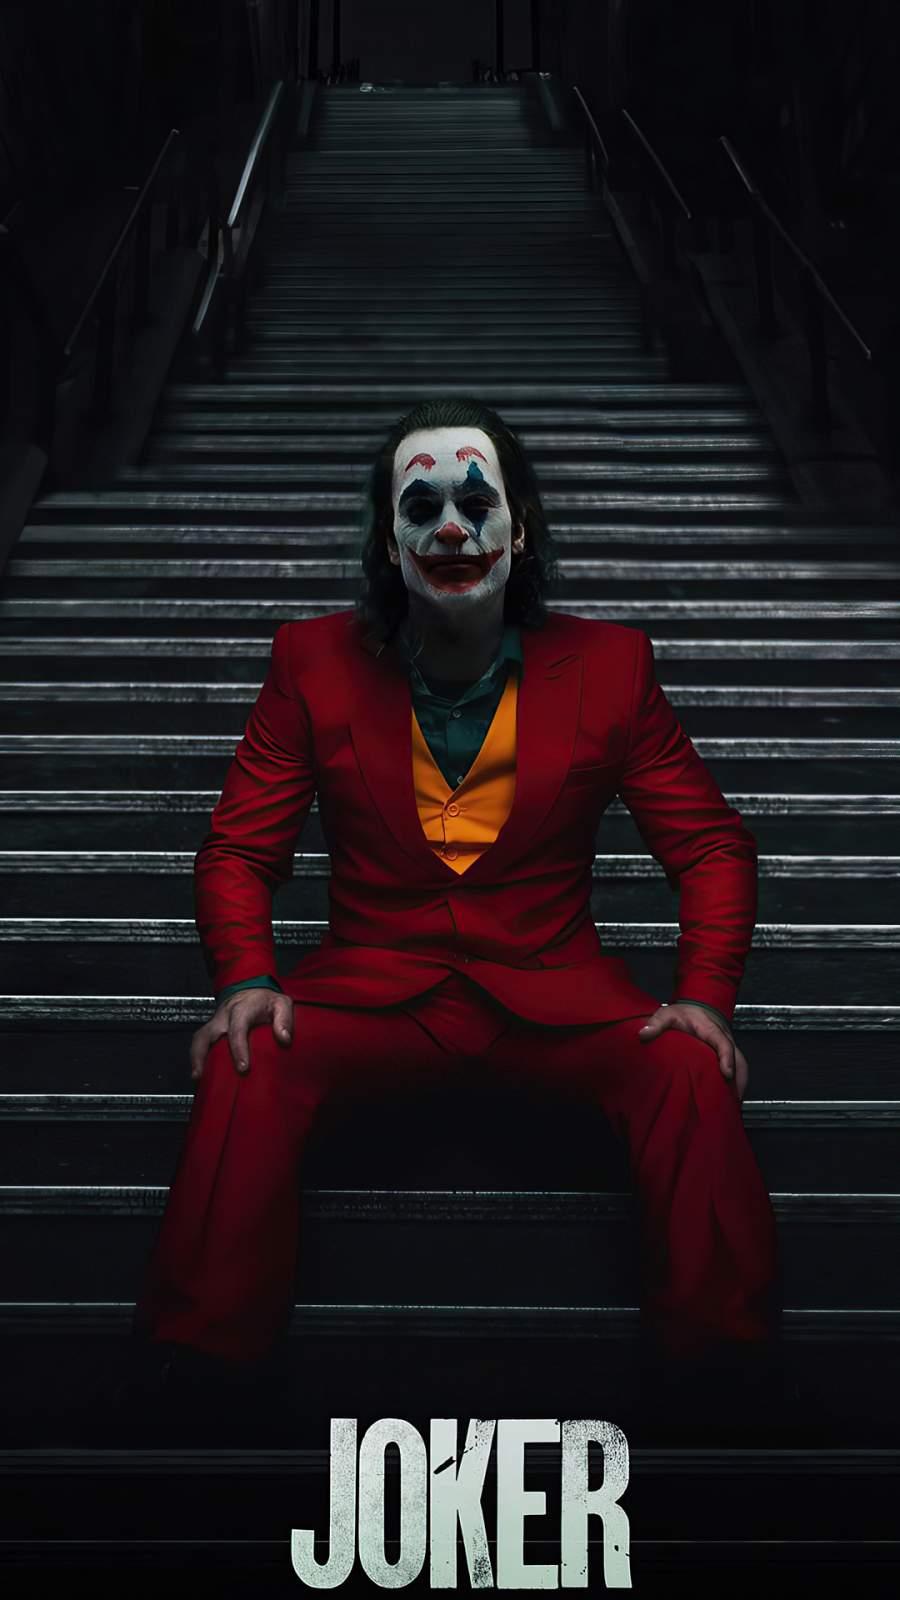 Joker Stairs iPhone Wallpaper